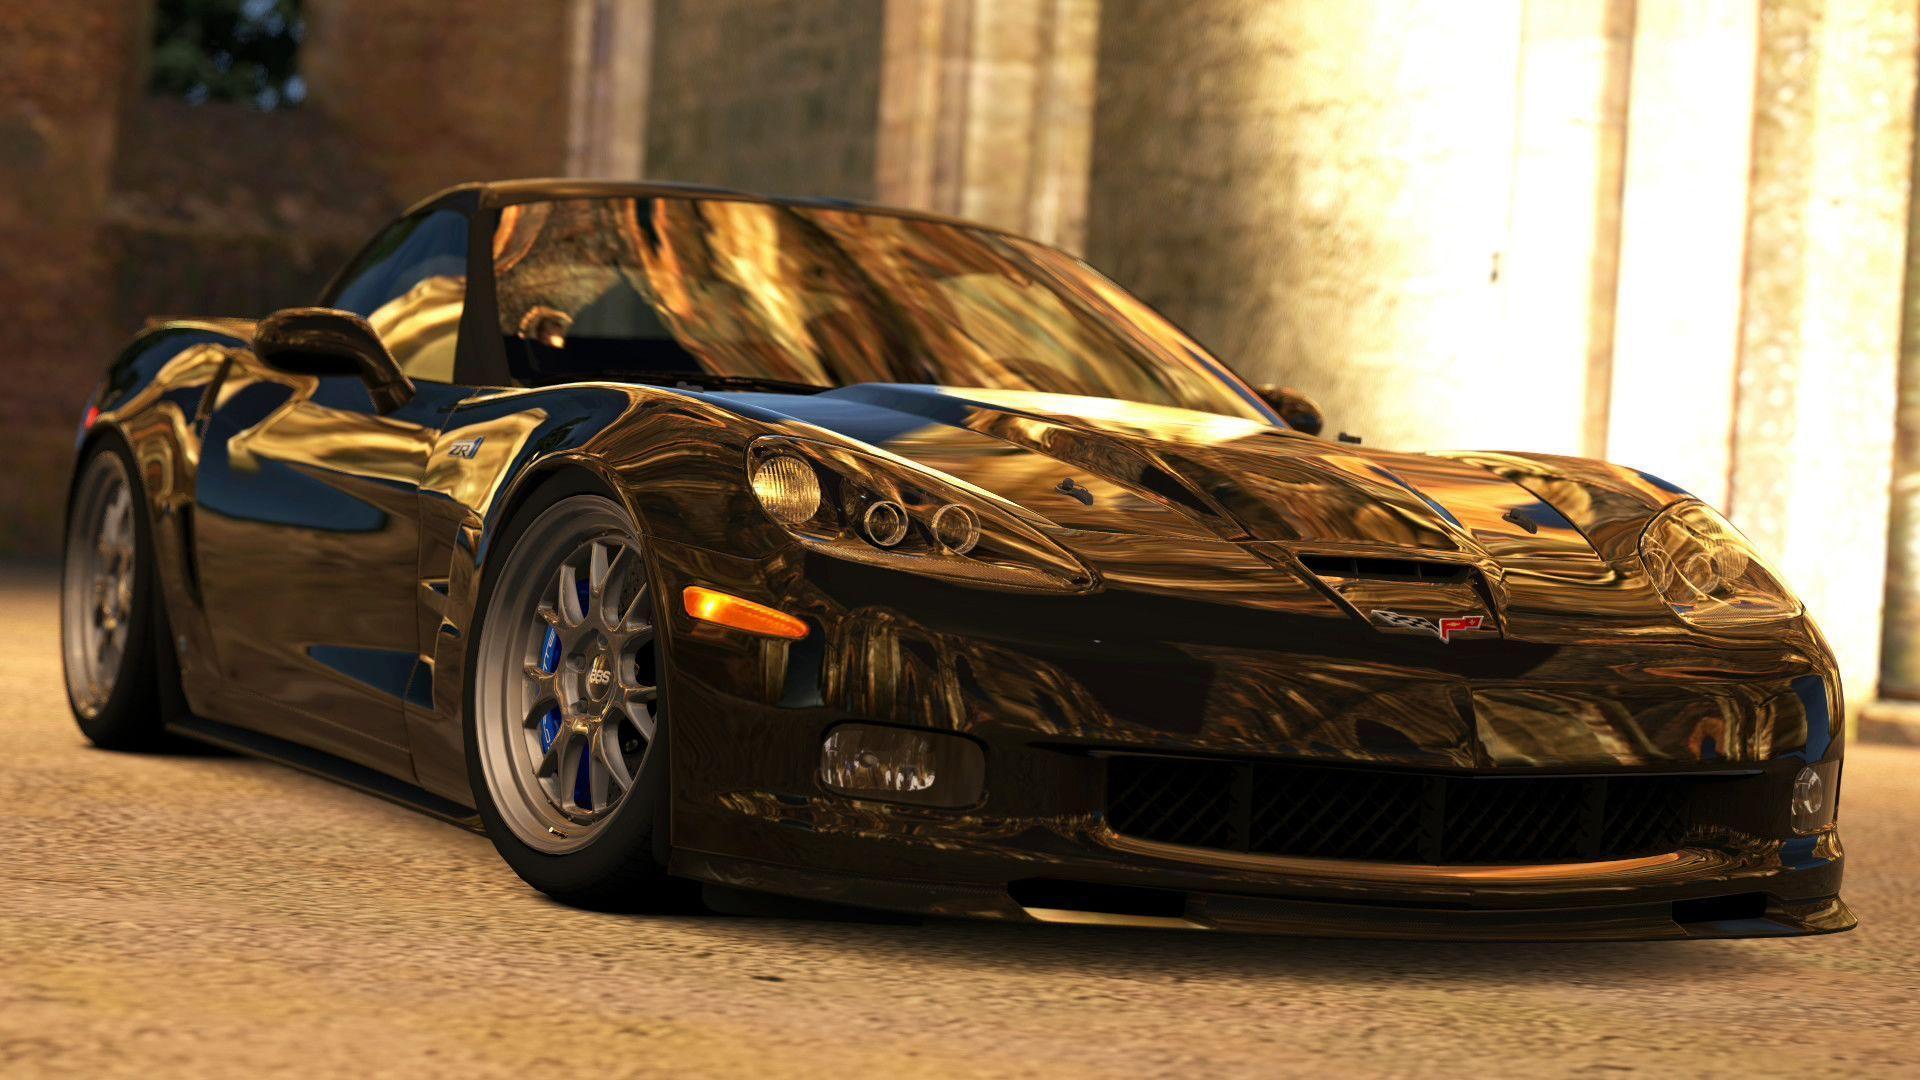 Corvette ZR1 Wallpapers - Wallpaper Cave